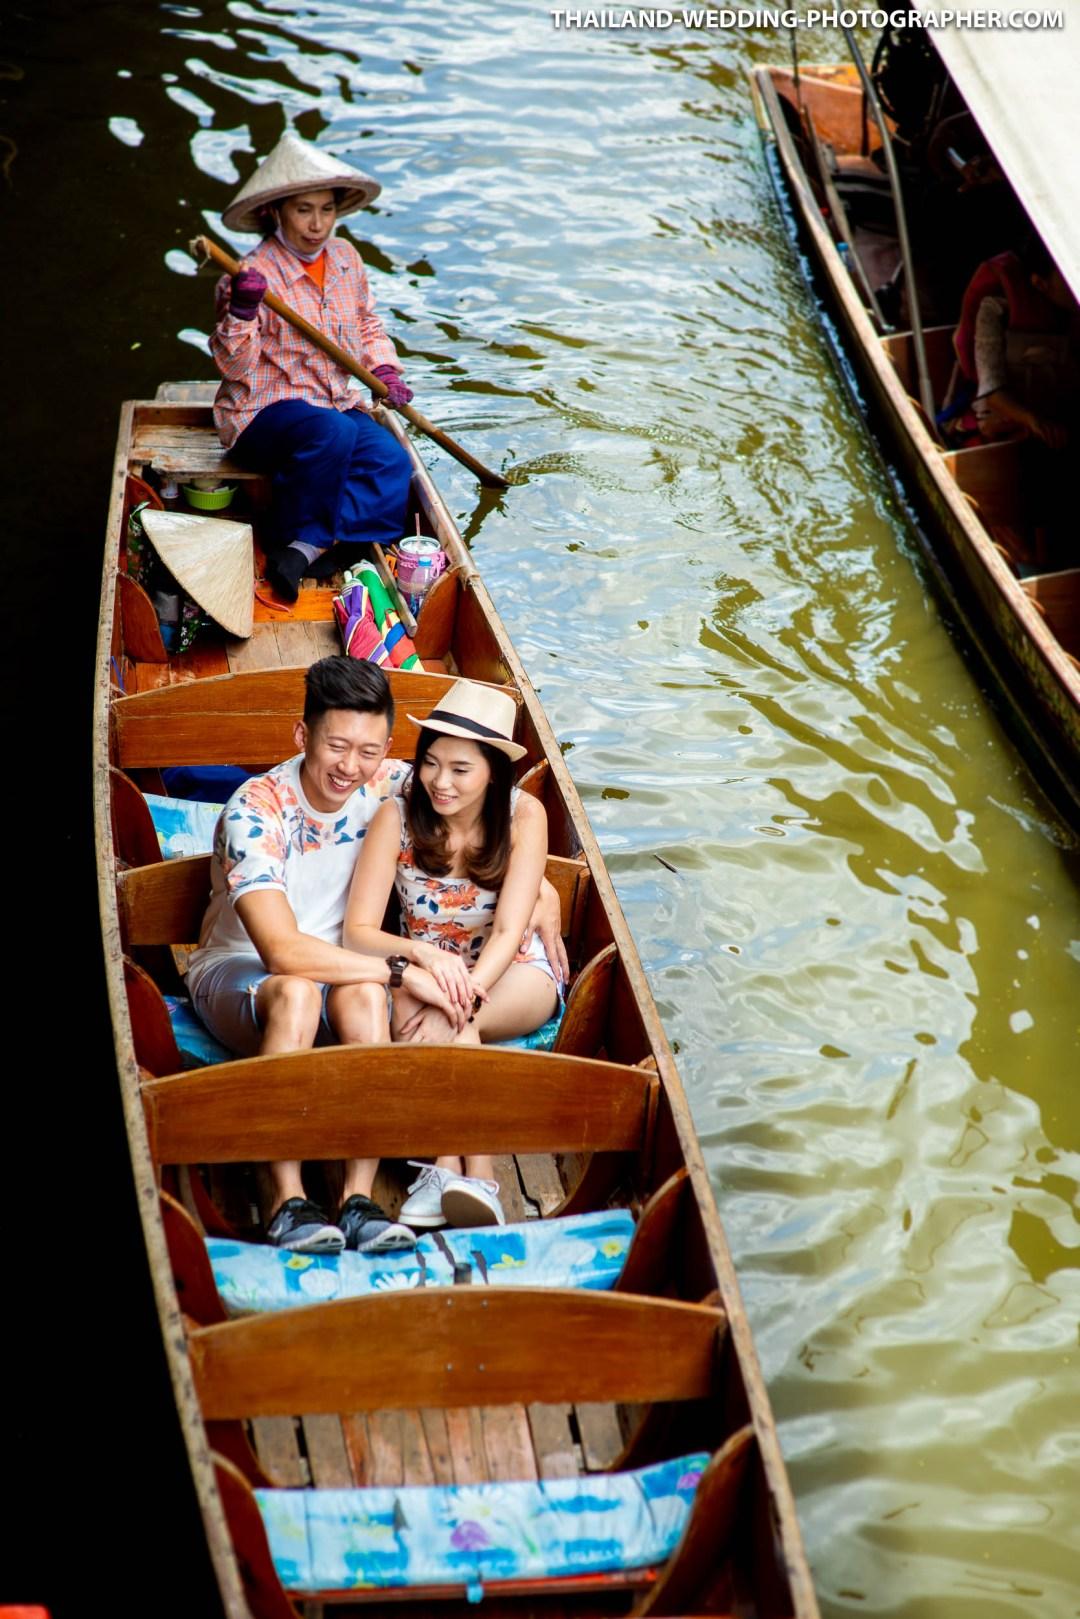 Damnoen Saduak Floating Market Thailand Pre-Wedding Photography